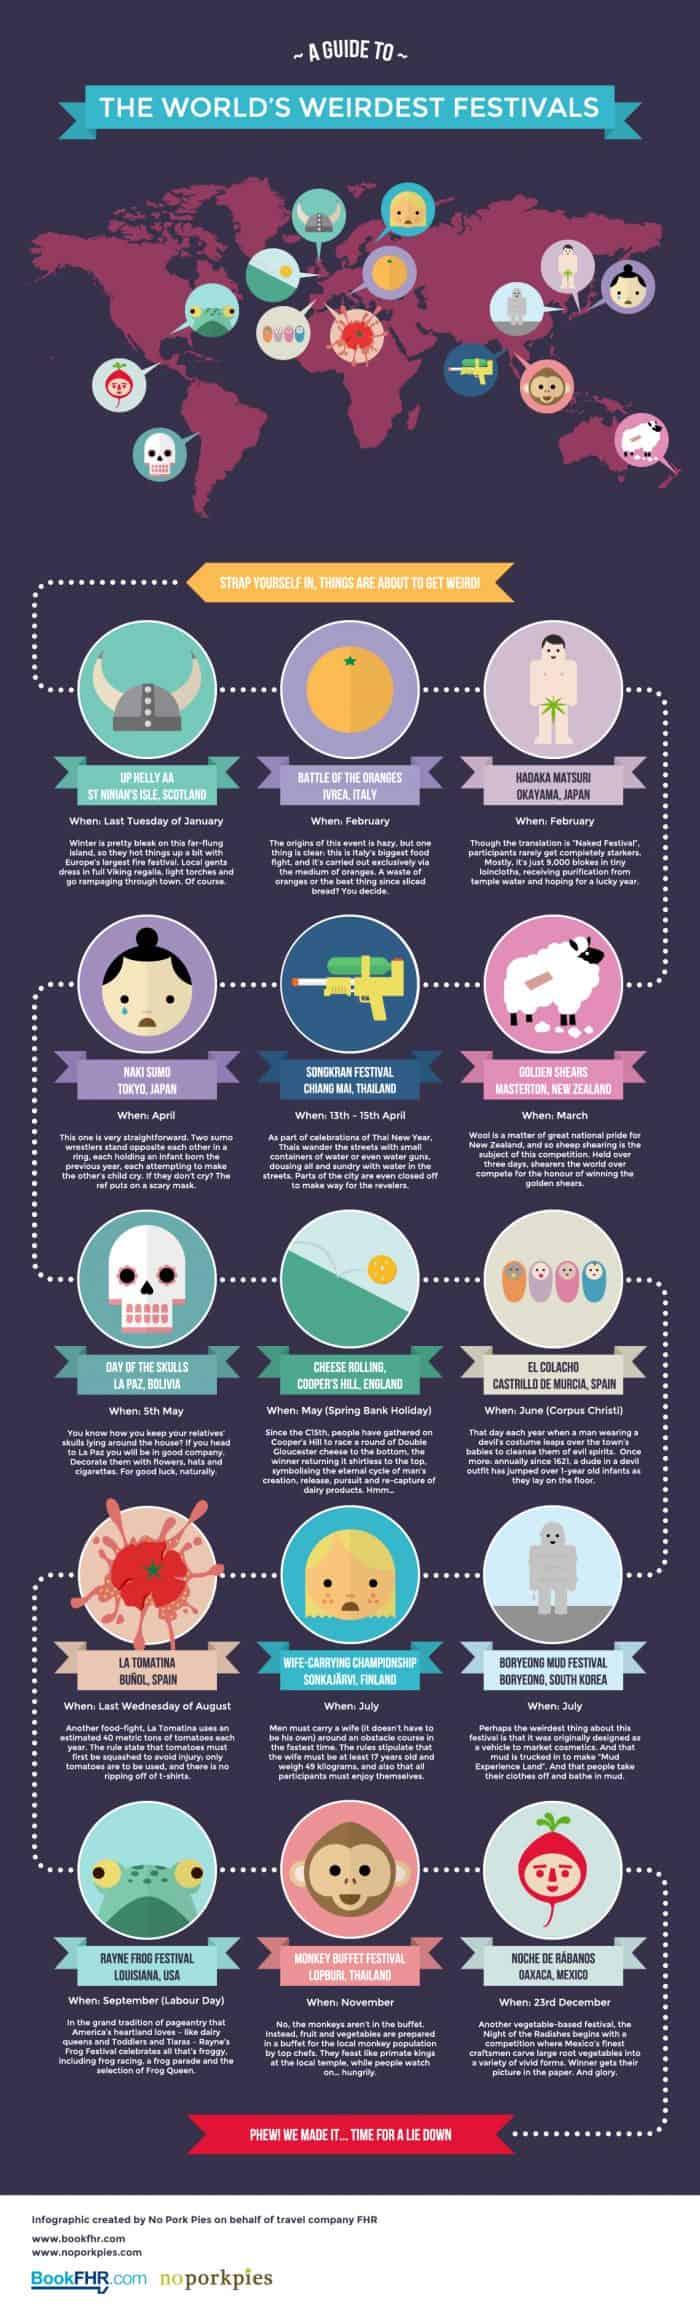 World's Weirdest Festivals Infographic